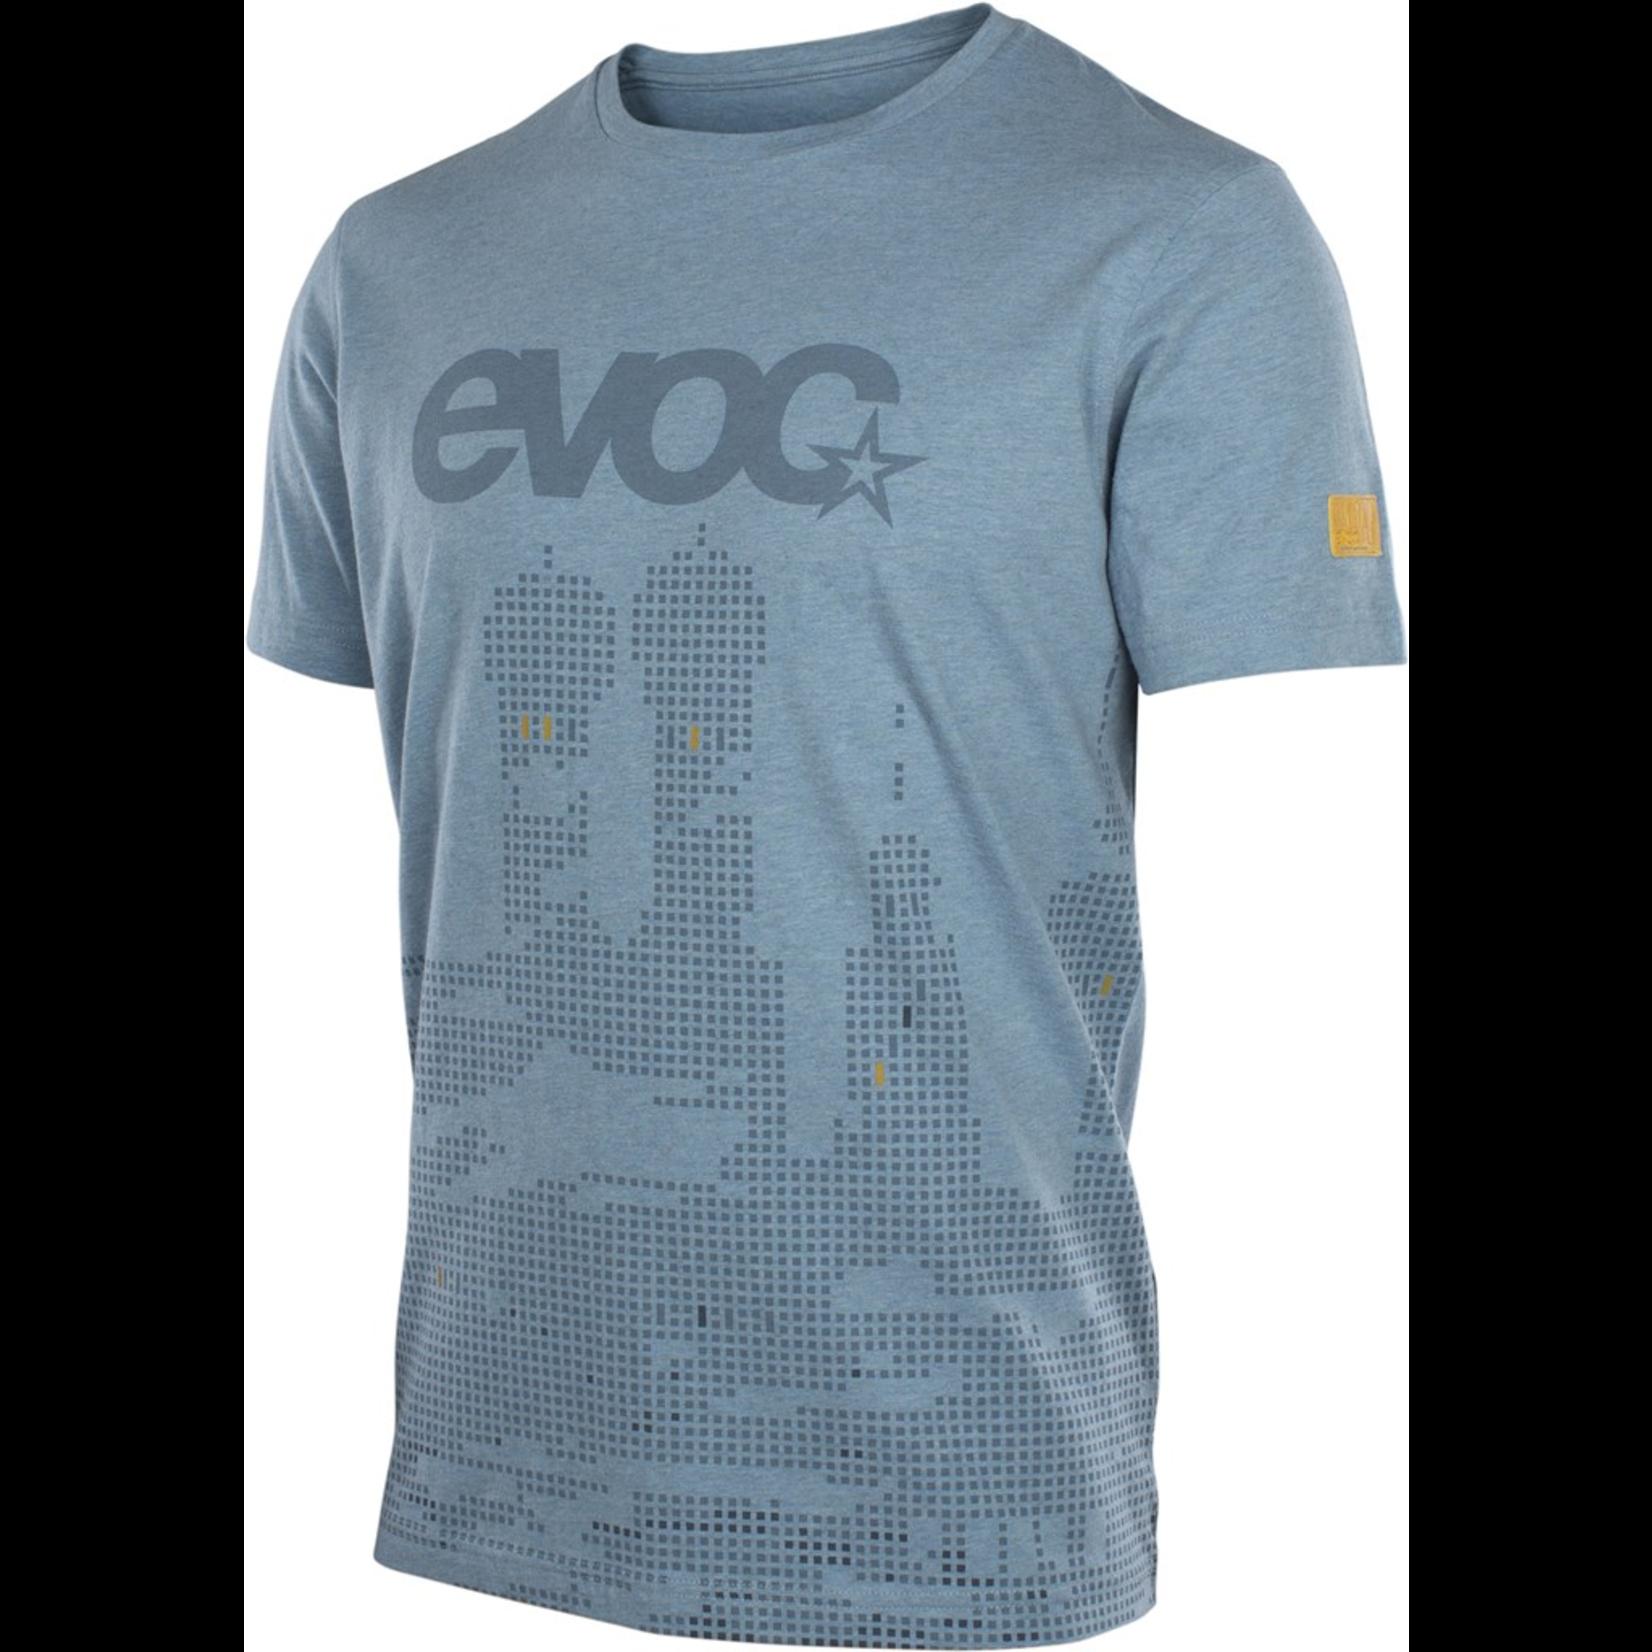 EVOC Evoc - Tshirt Multi Men Azzurra